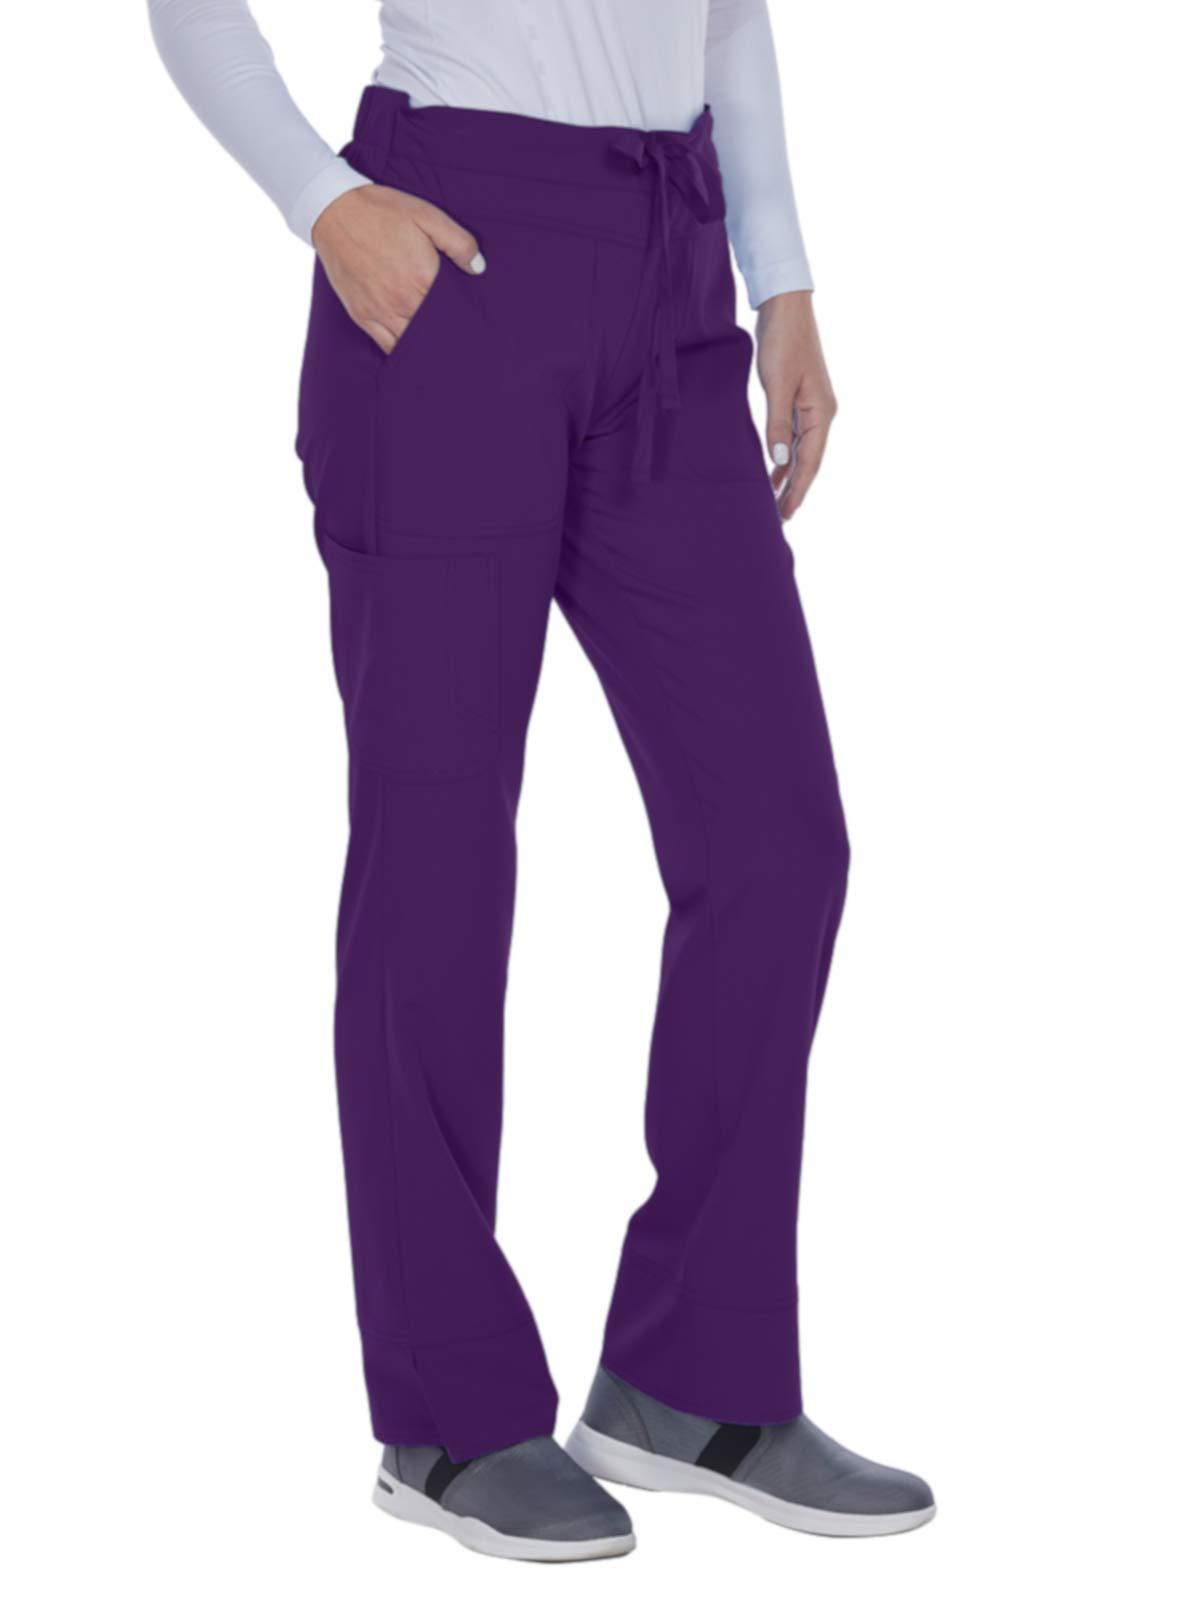 Grey's Anatomy Signature 2207 Callie Low Rise Pant Plush Purple XL Tall